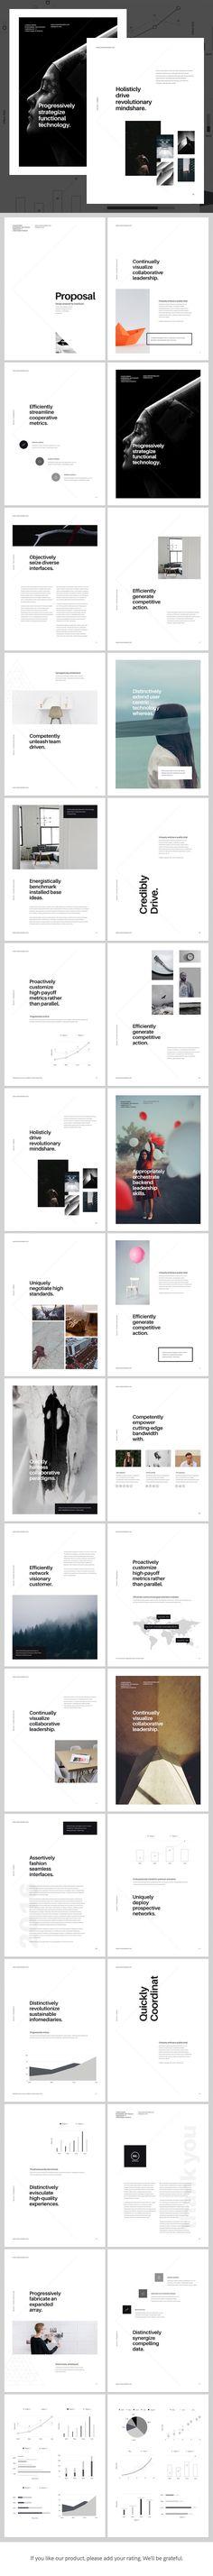 A4 Keynote Presentation for Print - Creative Keynote Templates                                                                                                                                                                                 More